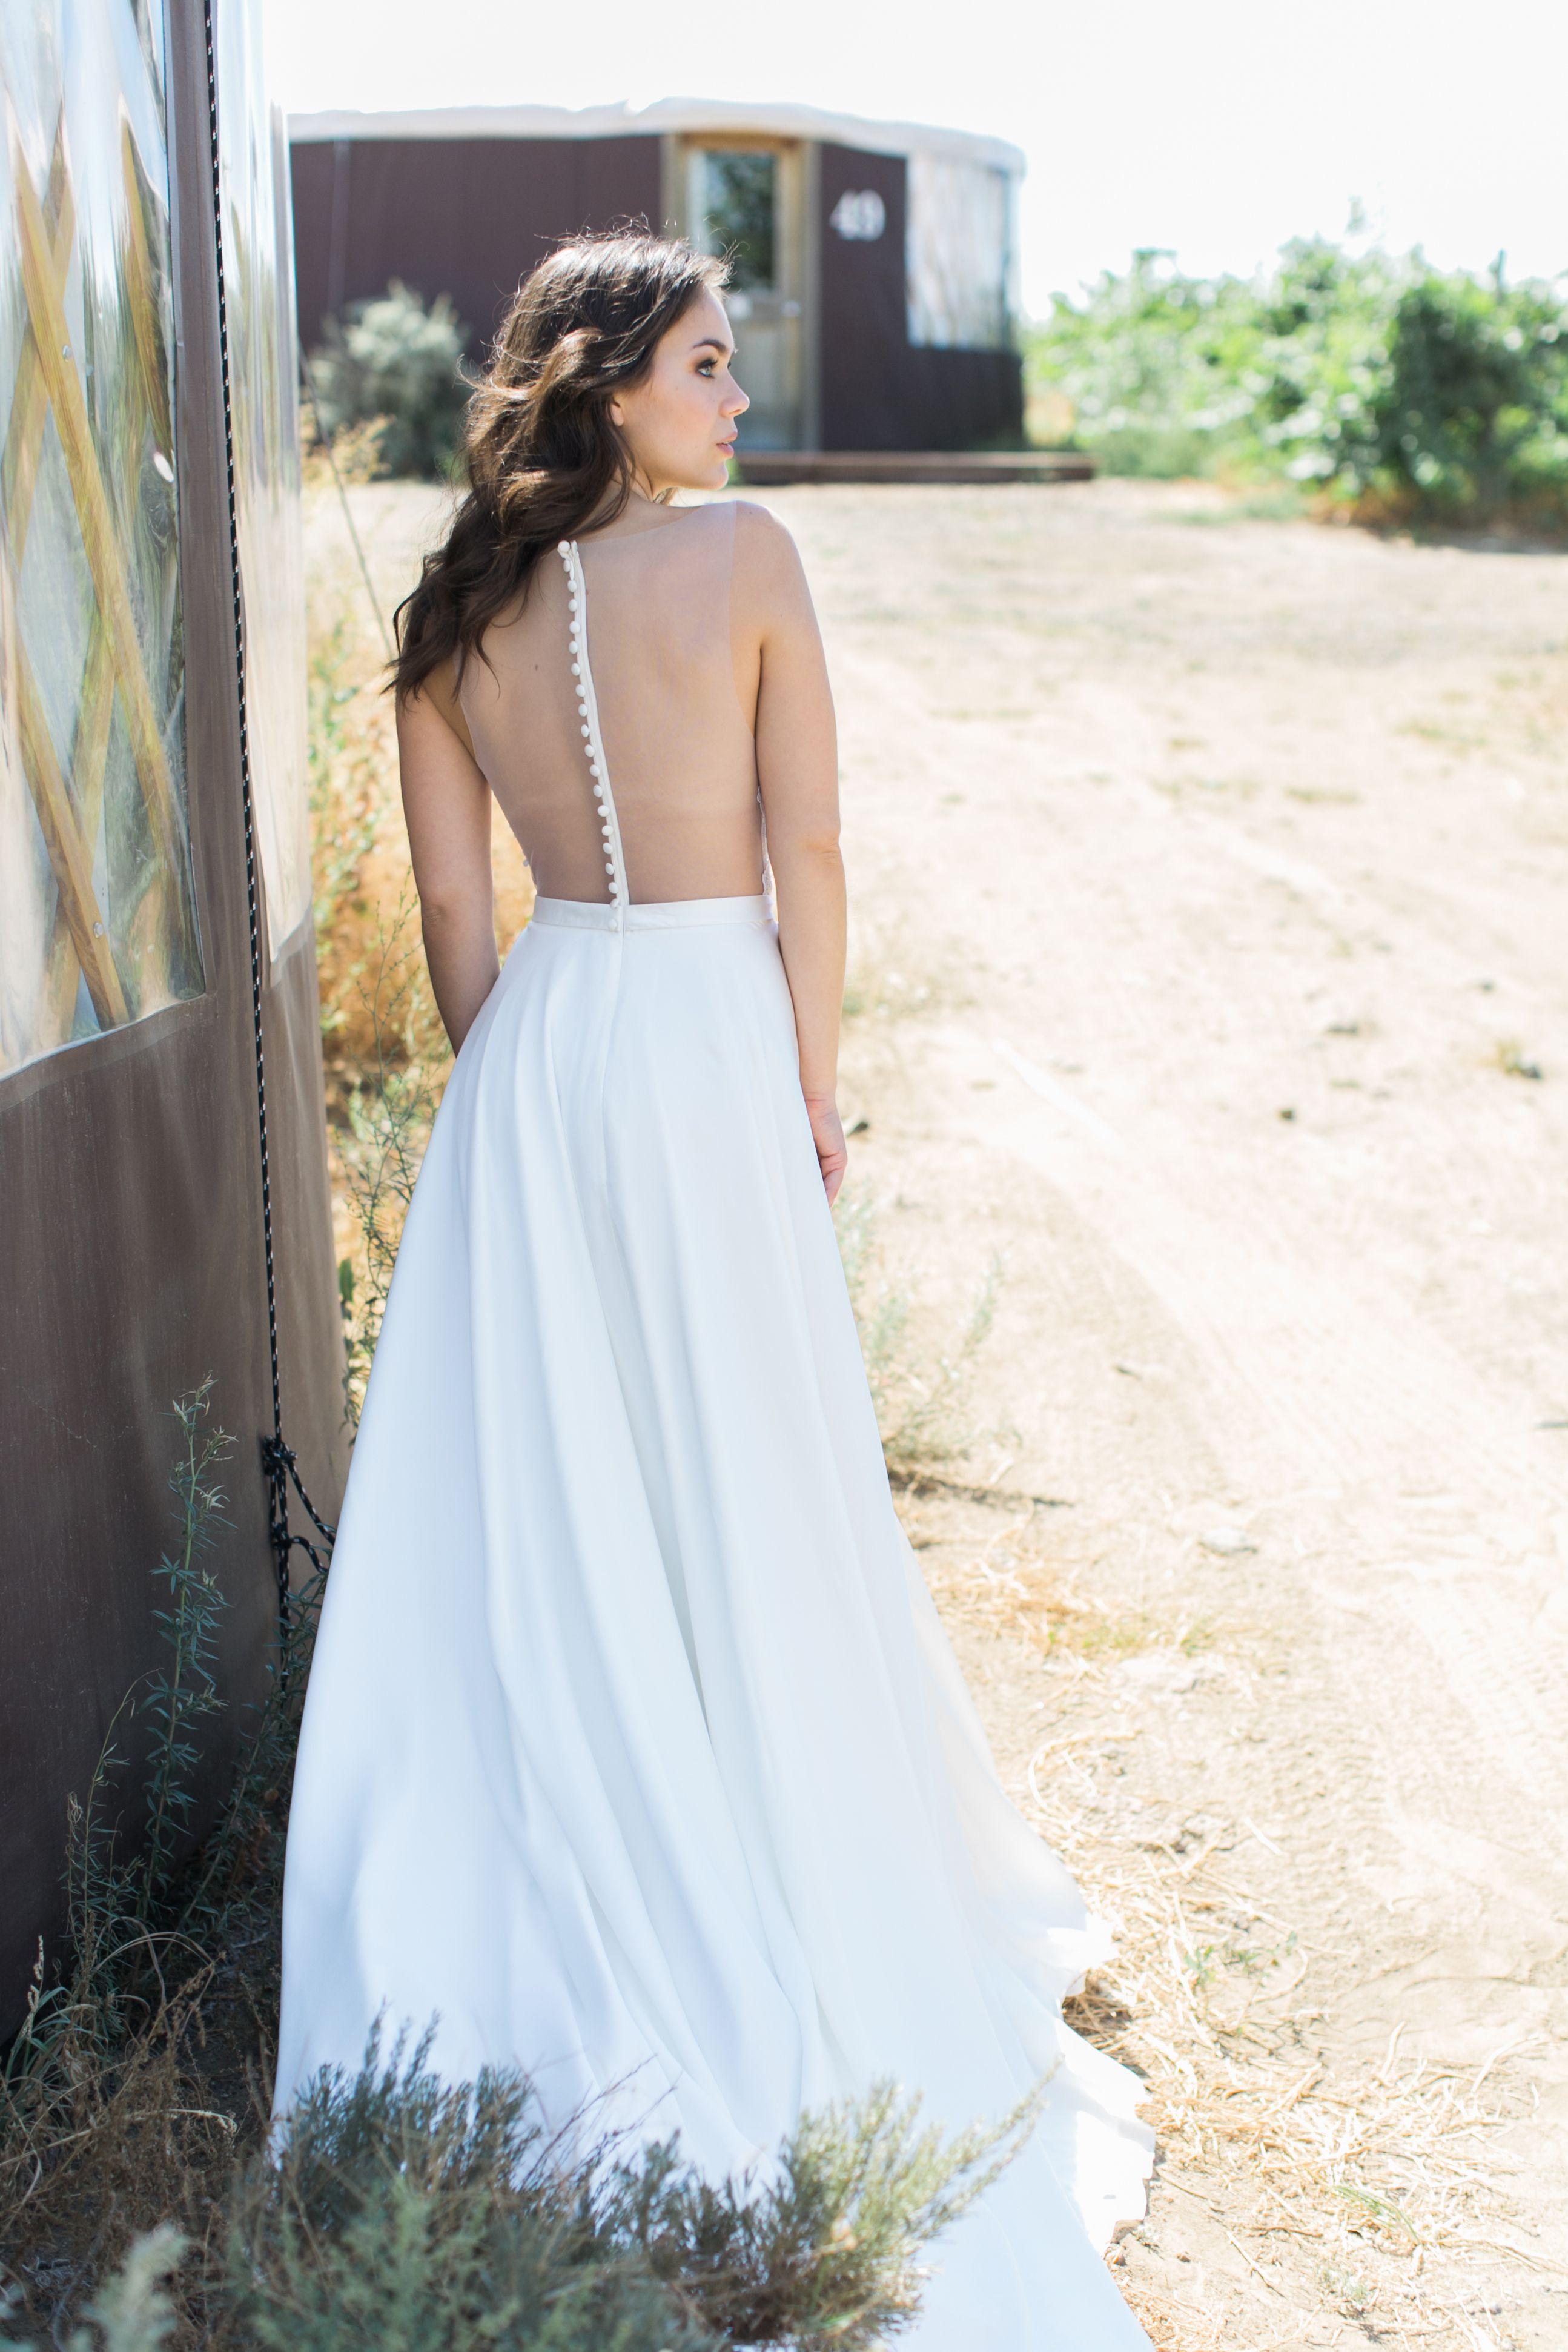 Petal Dress Back By Desiree Hartsock Bridal Boho Wedding Inspo Fancy Dresses Boho Wedding Gowns